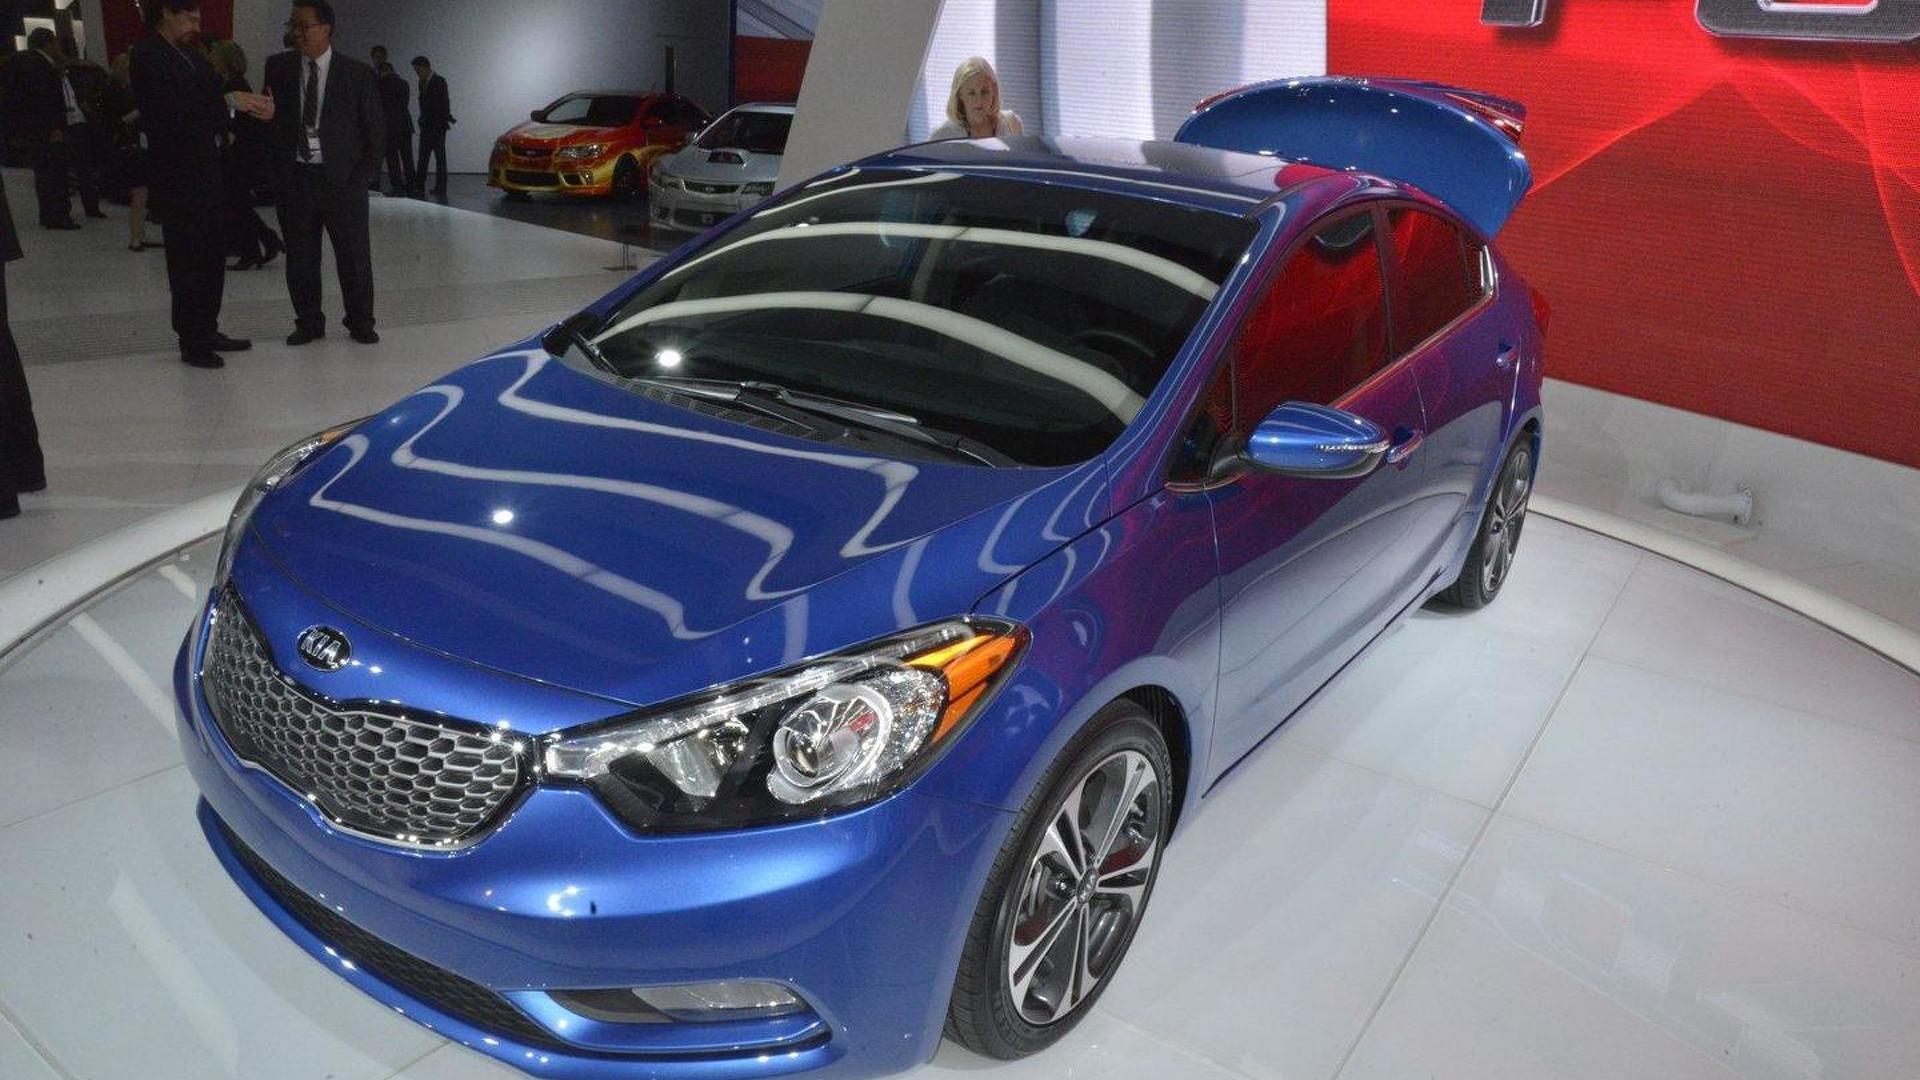 2014 Kia Forte sedan priced from 15,900 USD*